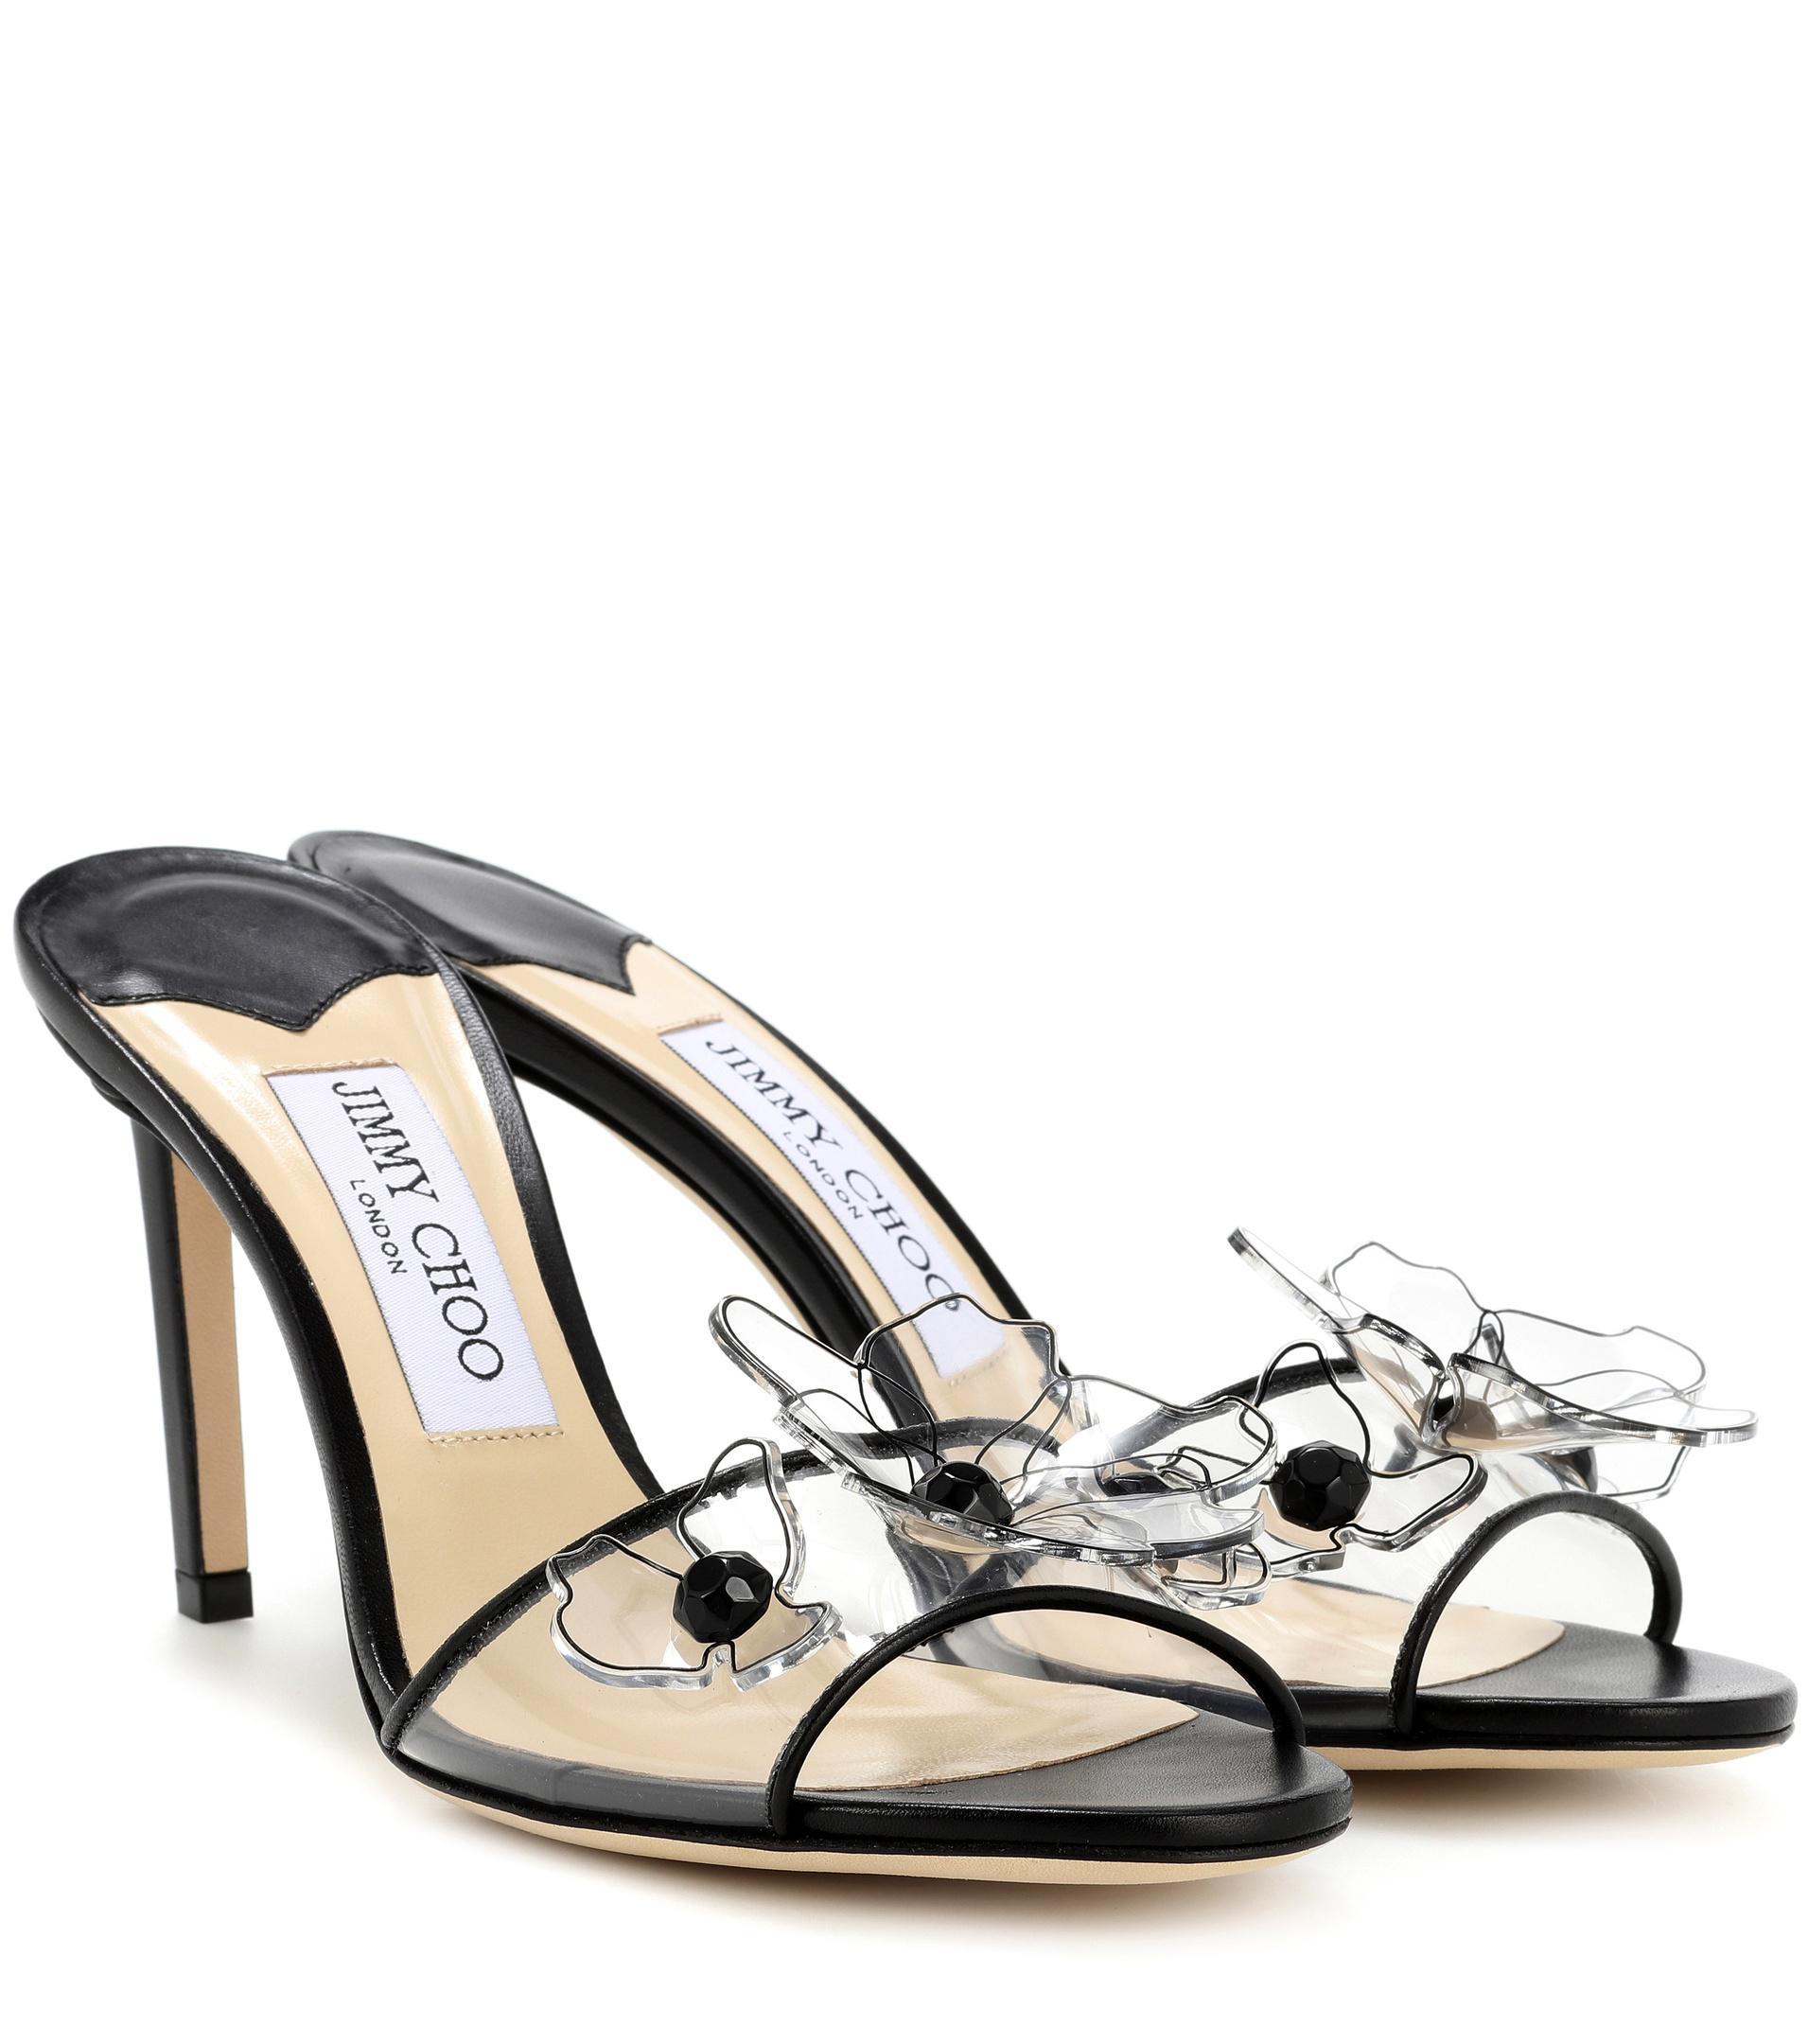 Jimmy choo Saskia 85 embellished sandals f4avv